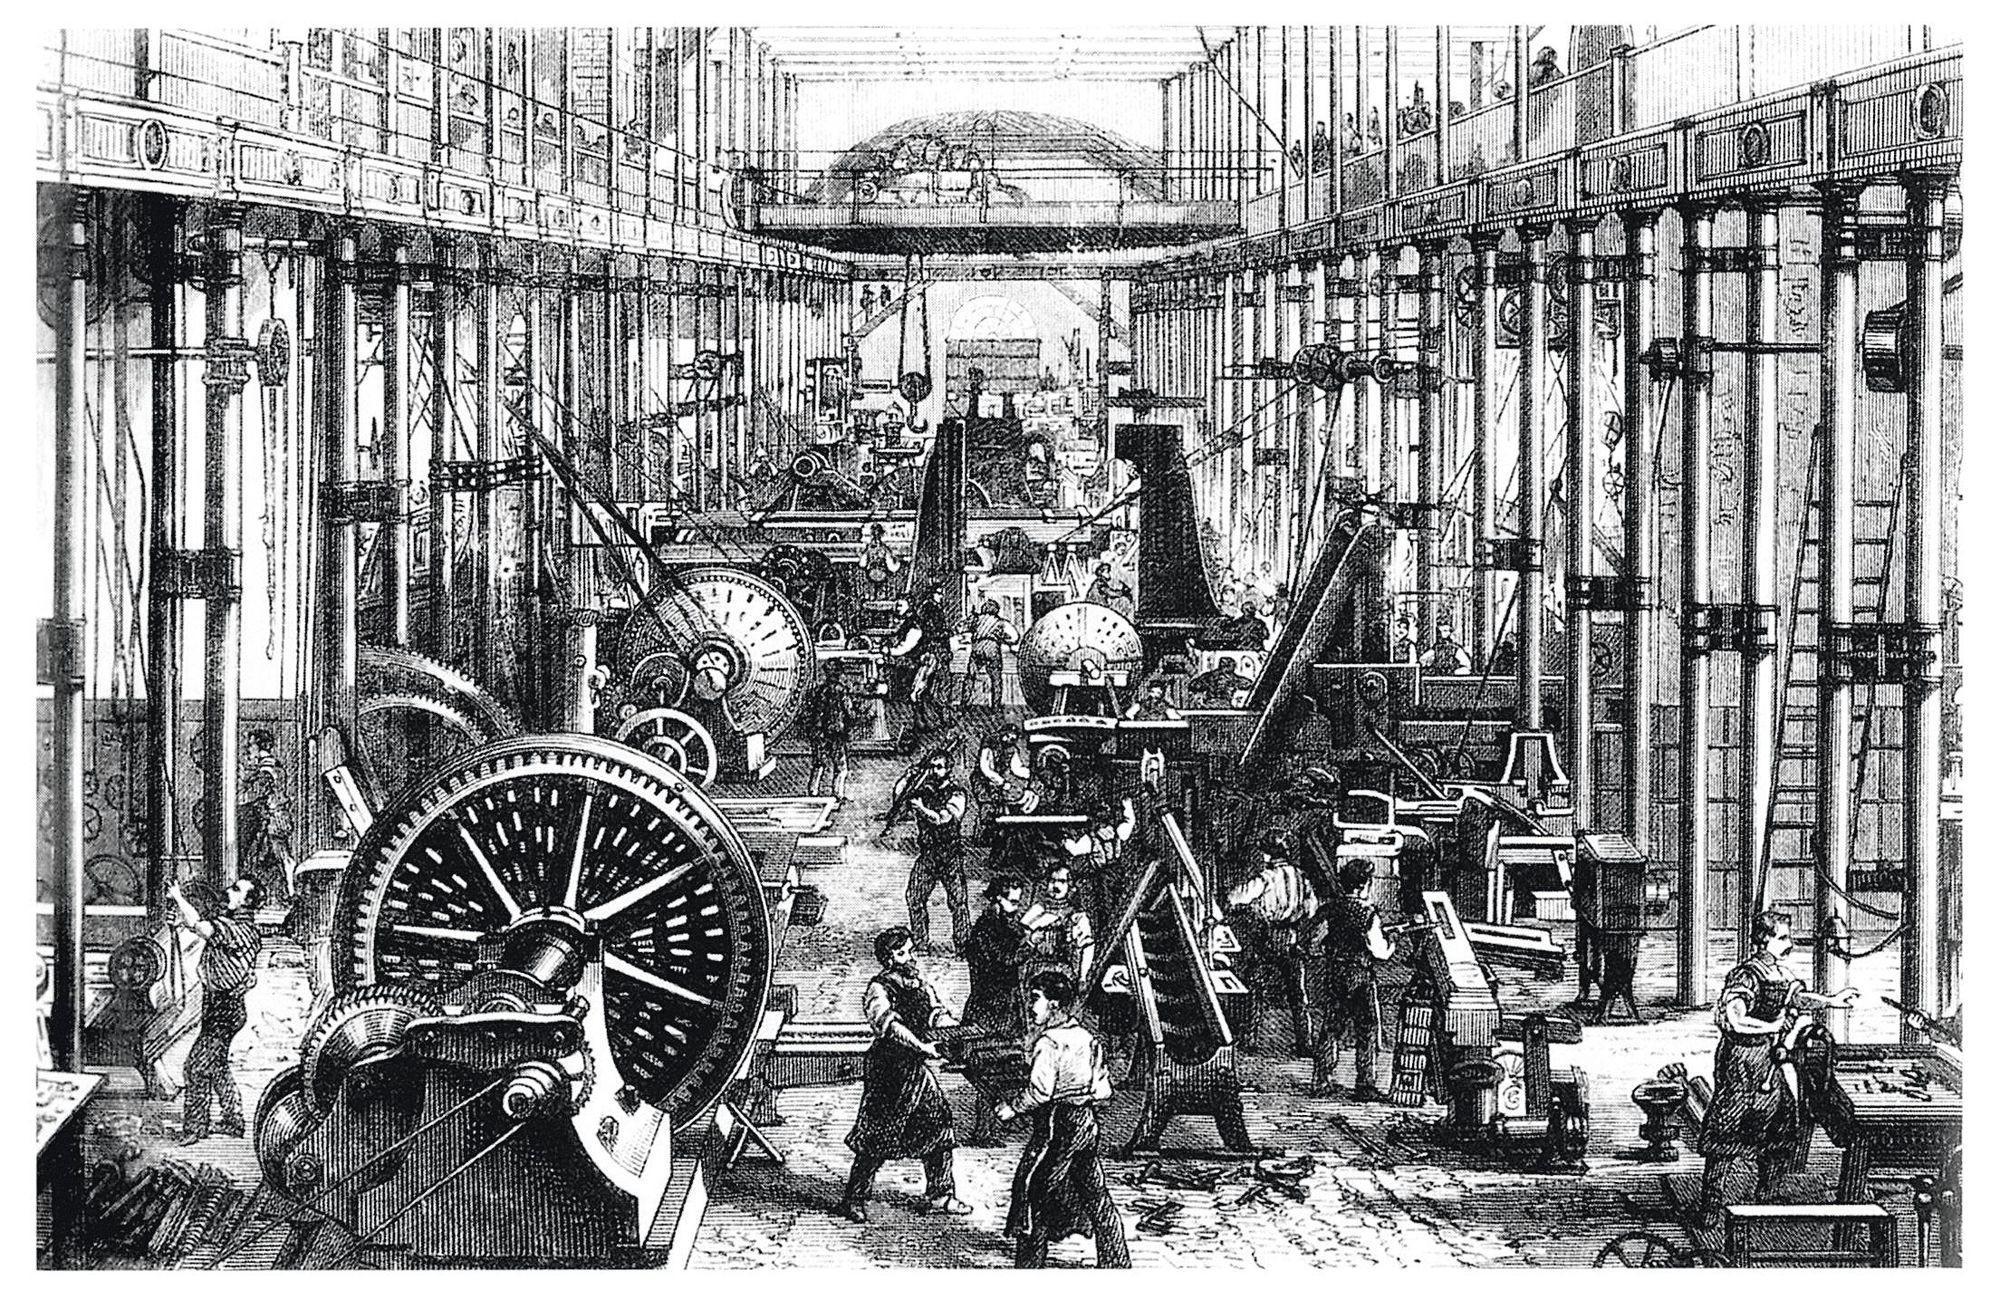 Anonyme, L'usine de Hartmann à Chemnitz (Allemagne), v. 1868, gravure.